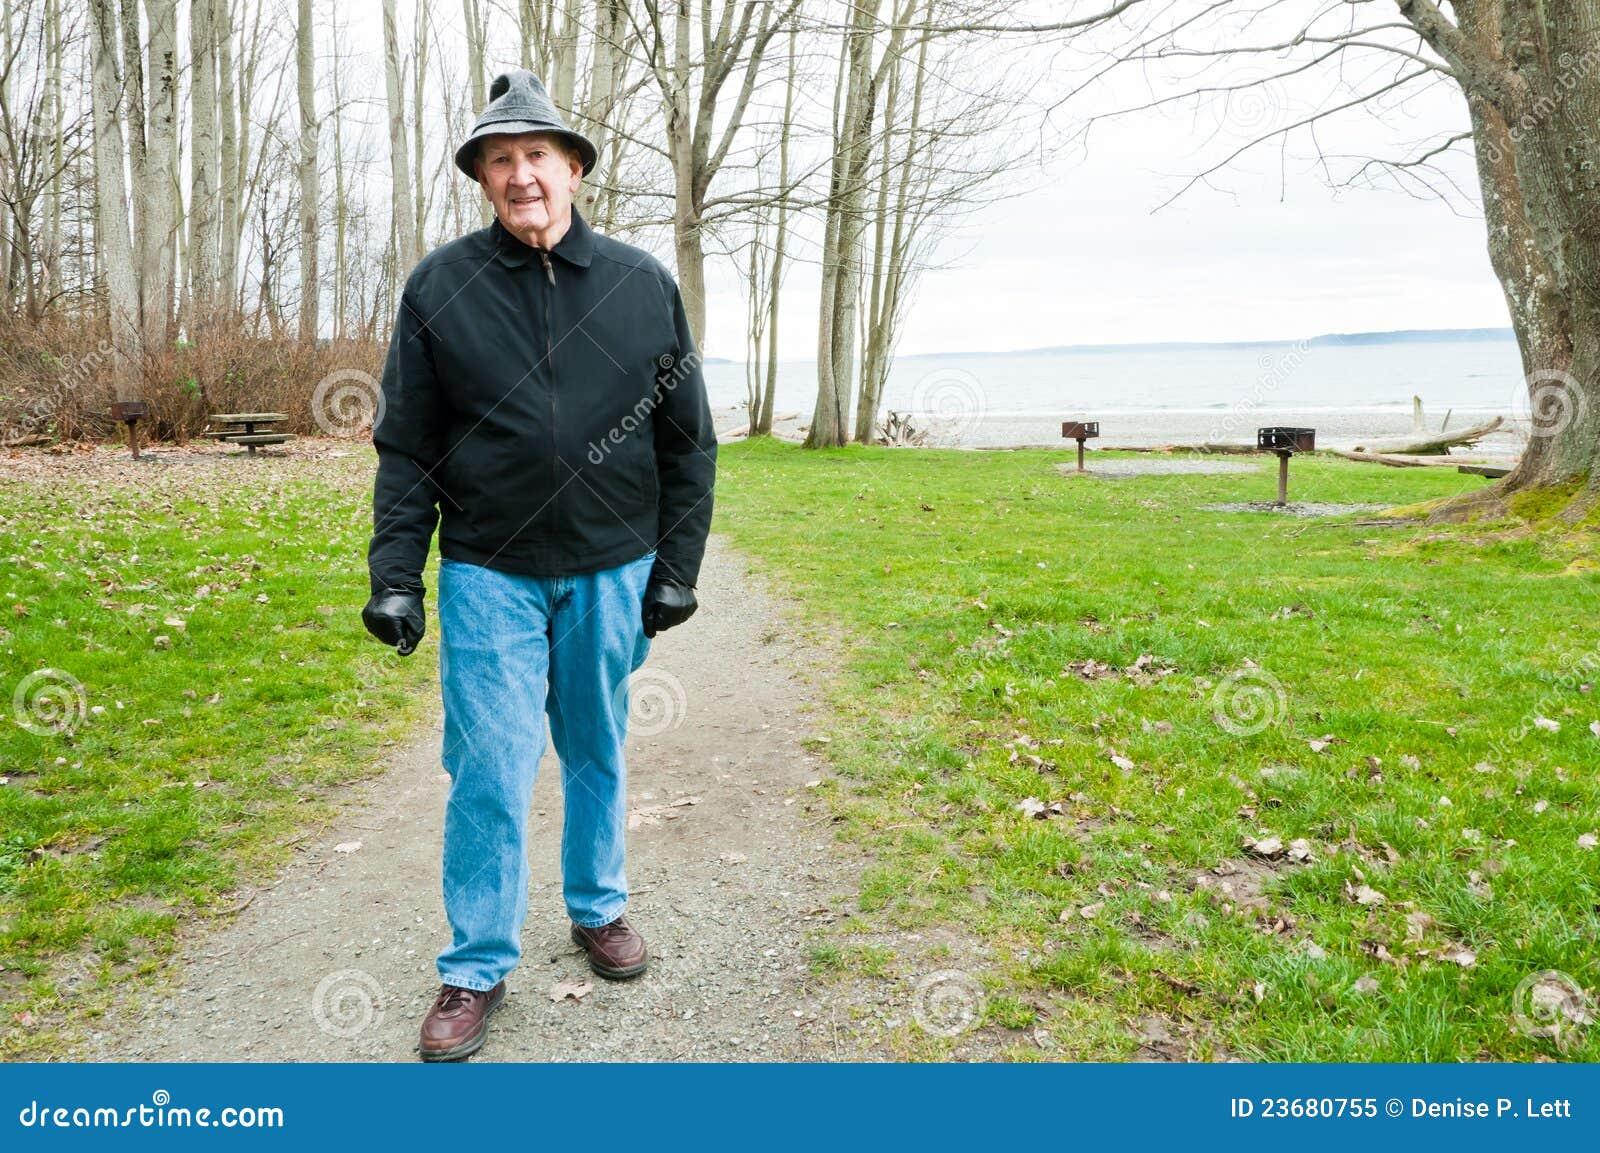 elderly man walking - photo #28